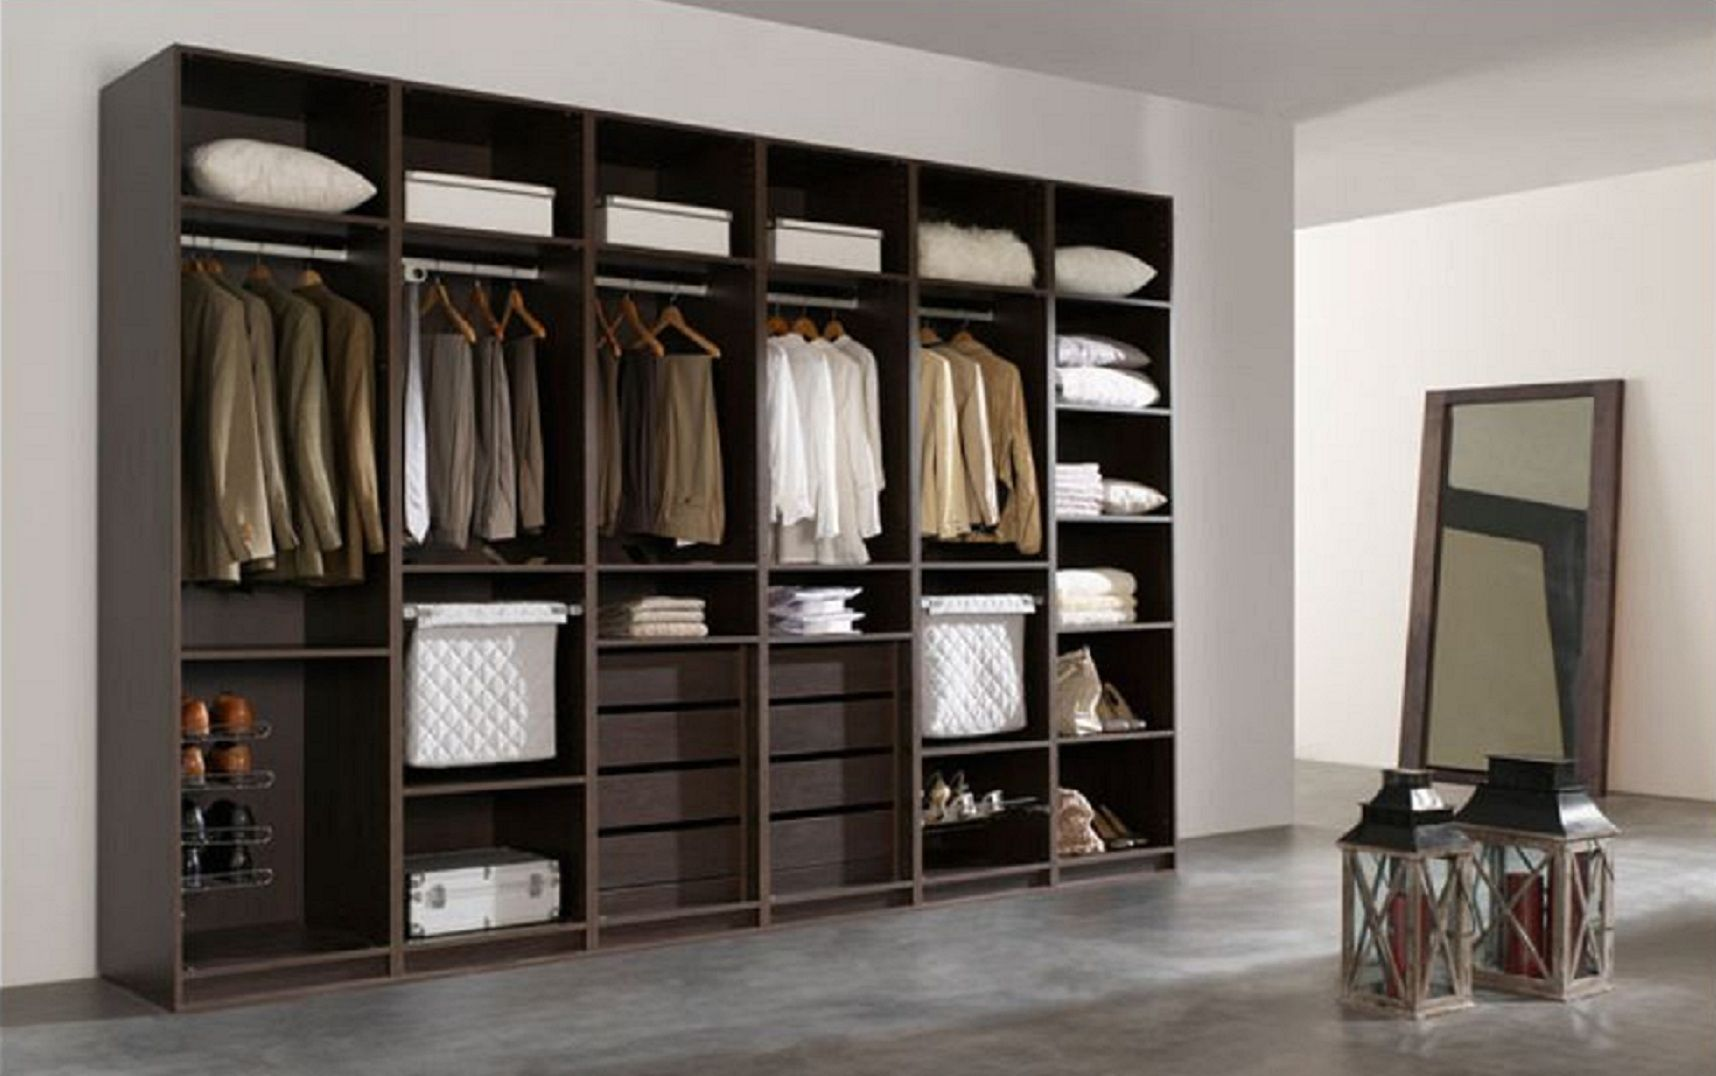 Vestidor 3 jpg 1716 1076 closet pinterest vestidor for Medidas para armar un ropero de melamina